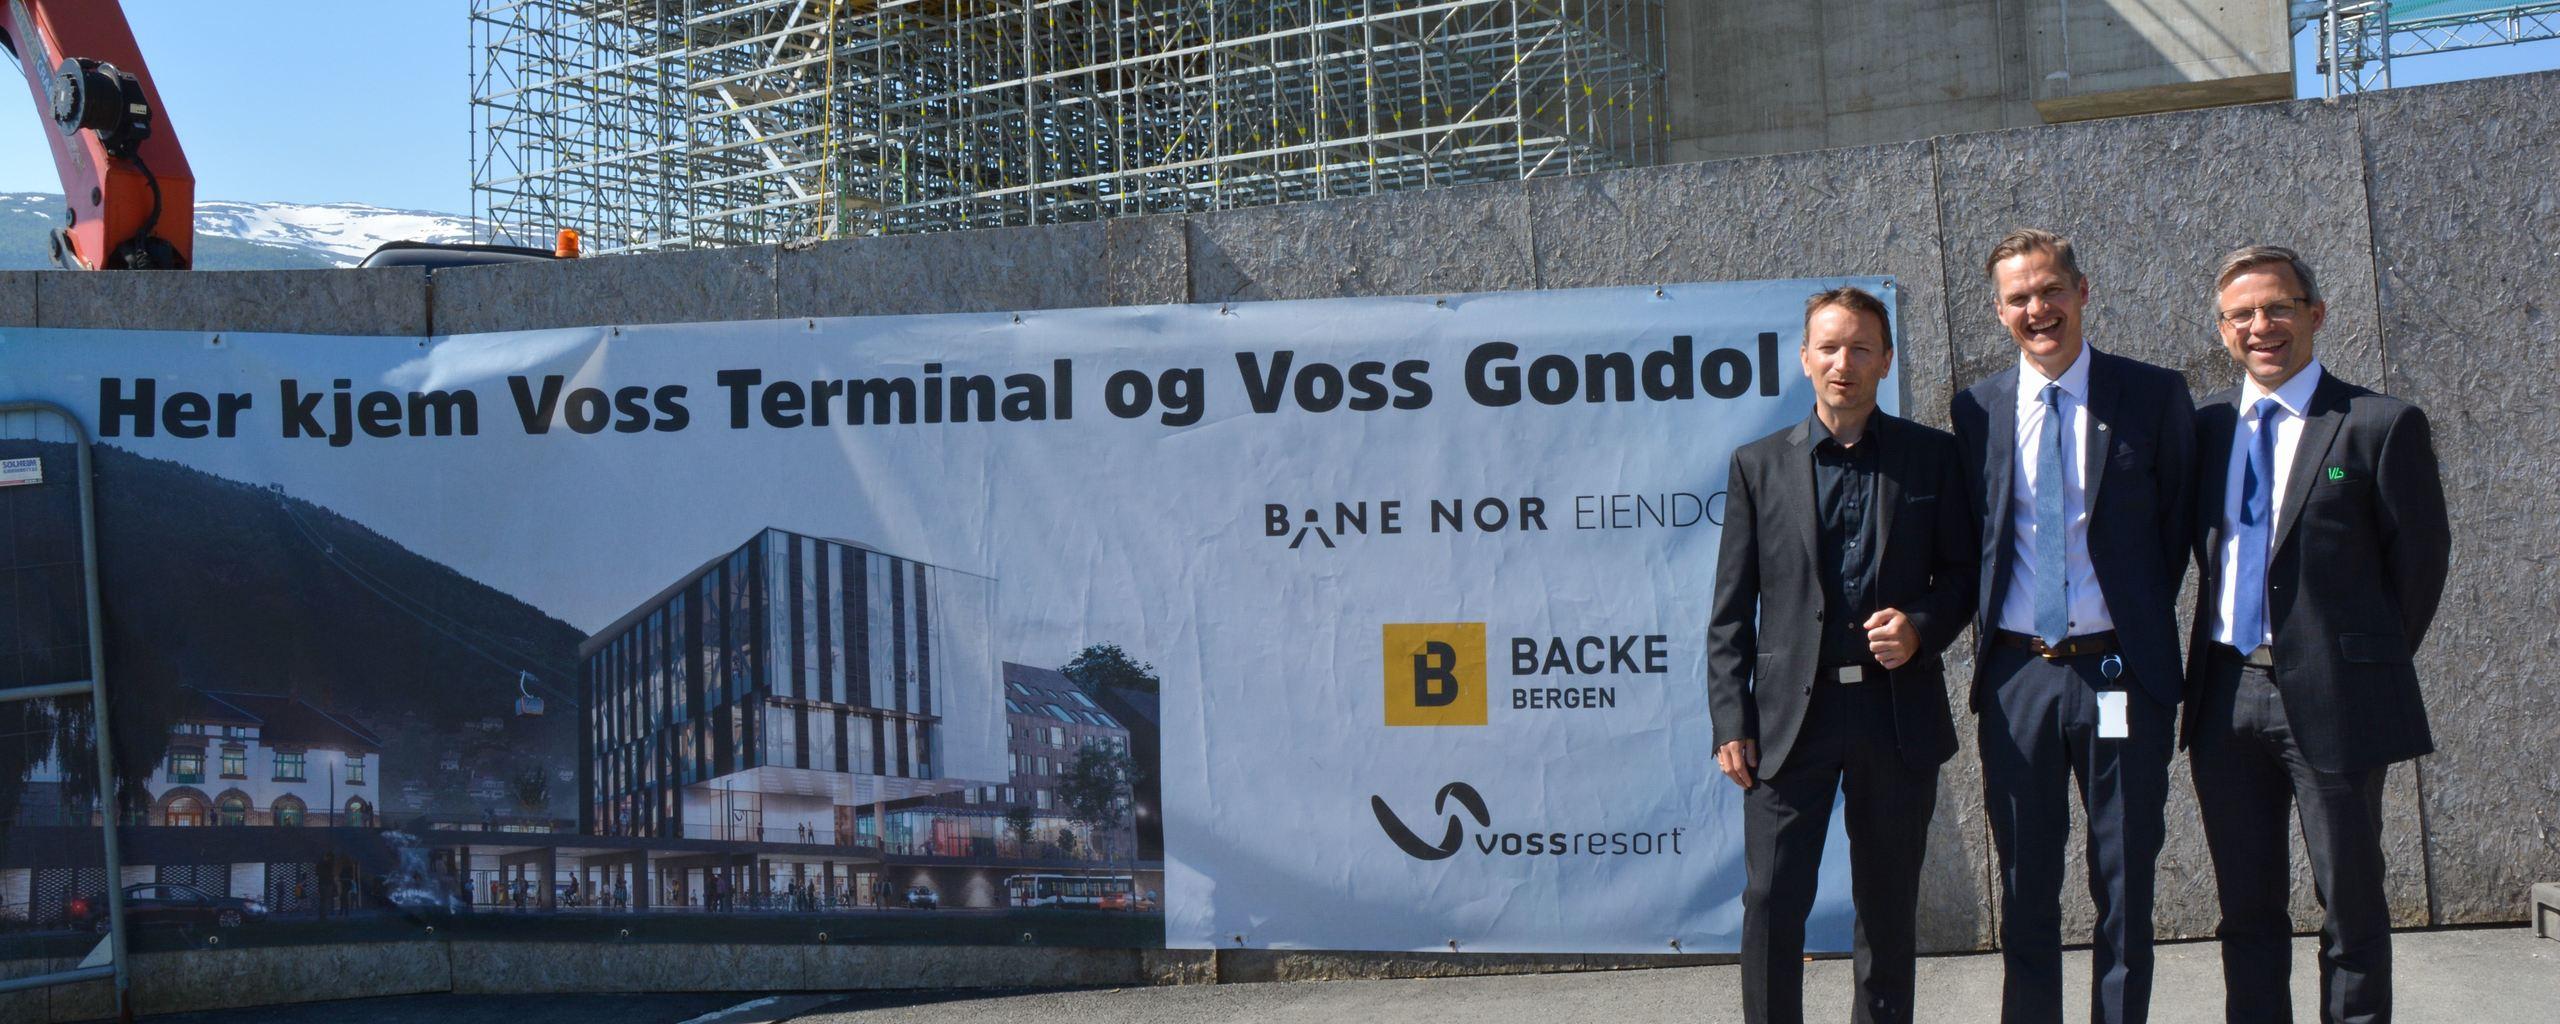 Asgeir Løno (regionbanksjef Sparebanken Vest), Jørund Rong (adm. banksjef Voss Sparebank) og Stig Gunnar Røthe (adm. banksjef Vekselbanken)